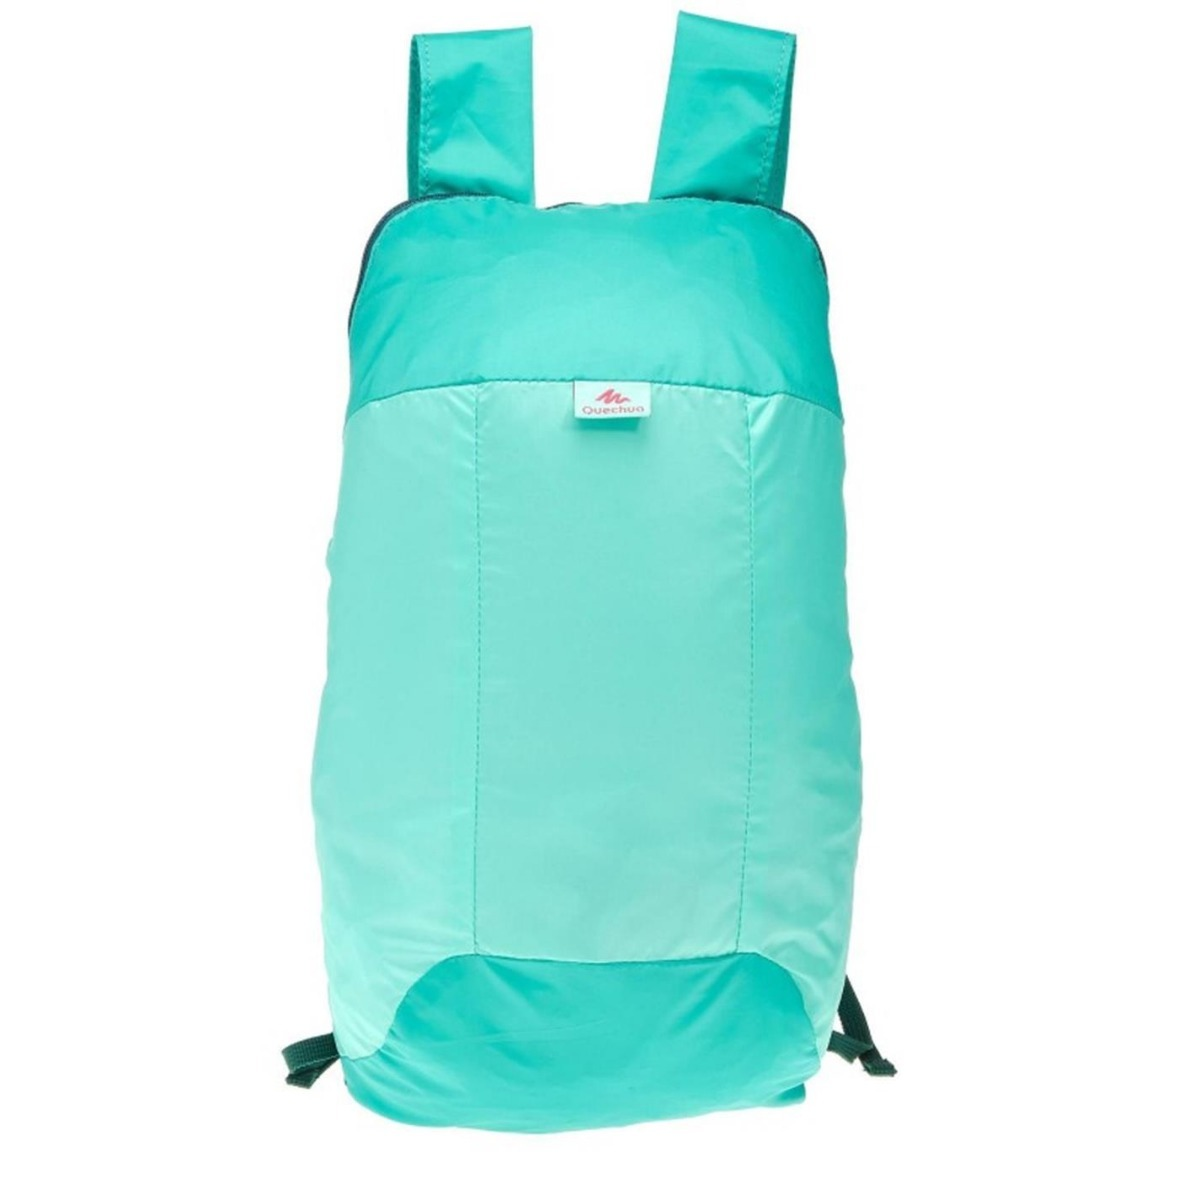 mochila quechua travel ultra compacta 10 litros verde claro. Cargando zoom. 49a9042a8c724